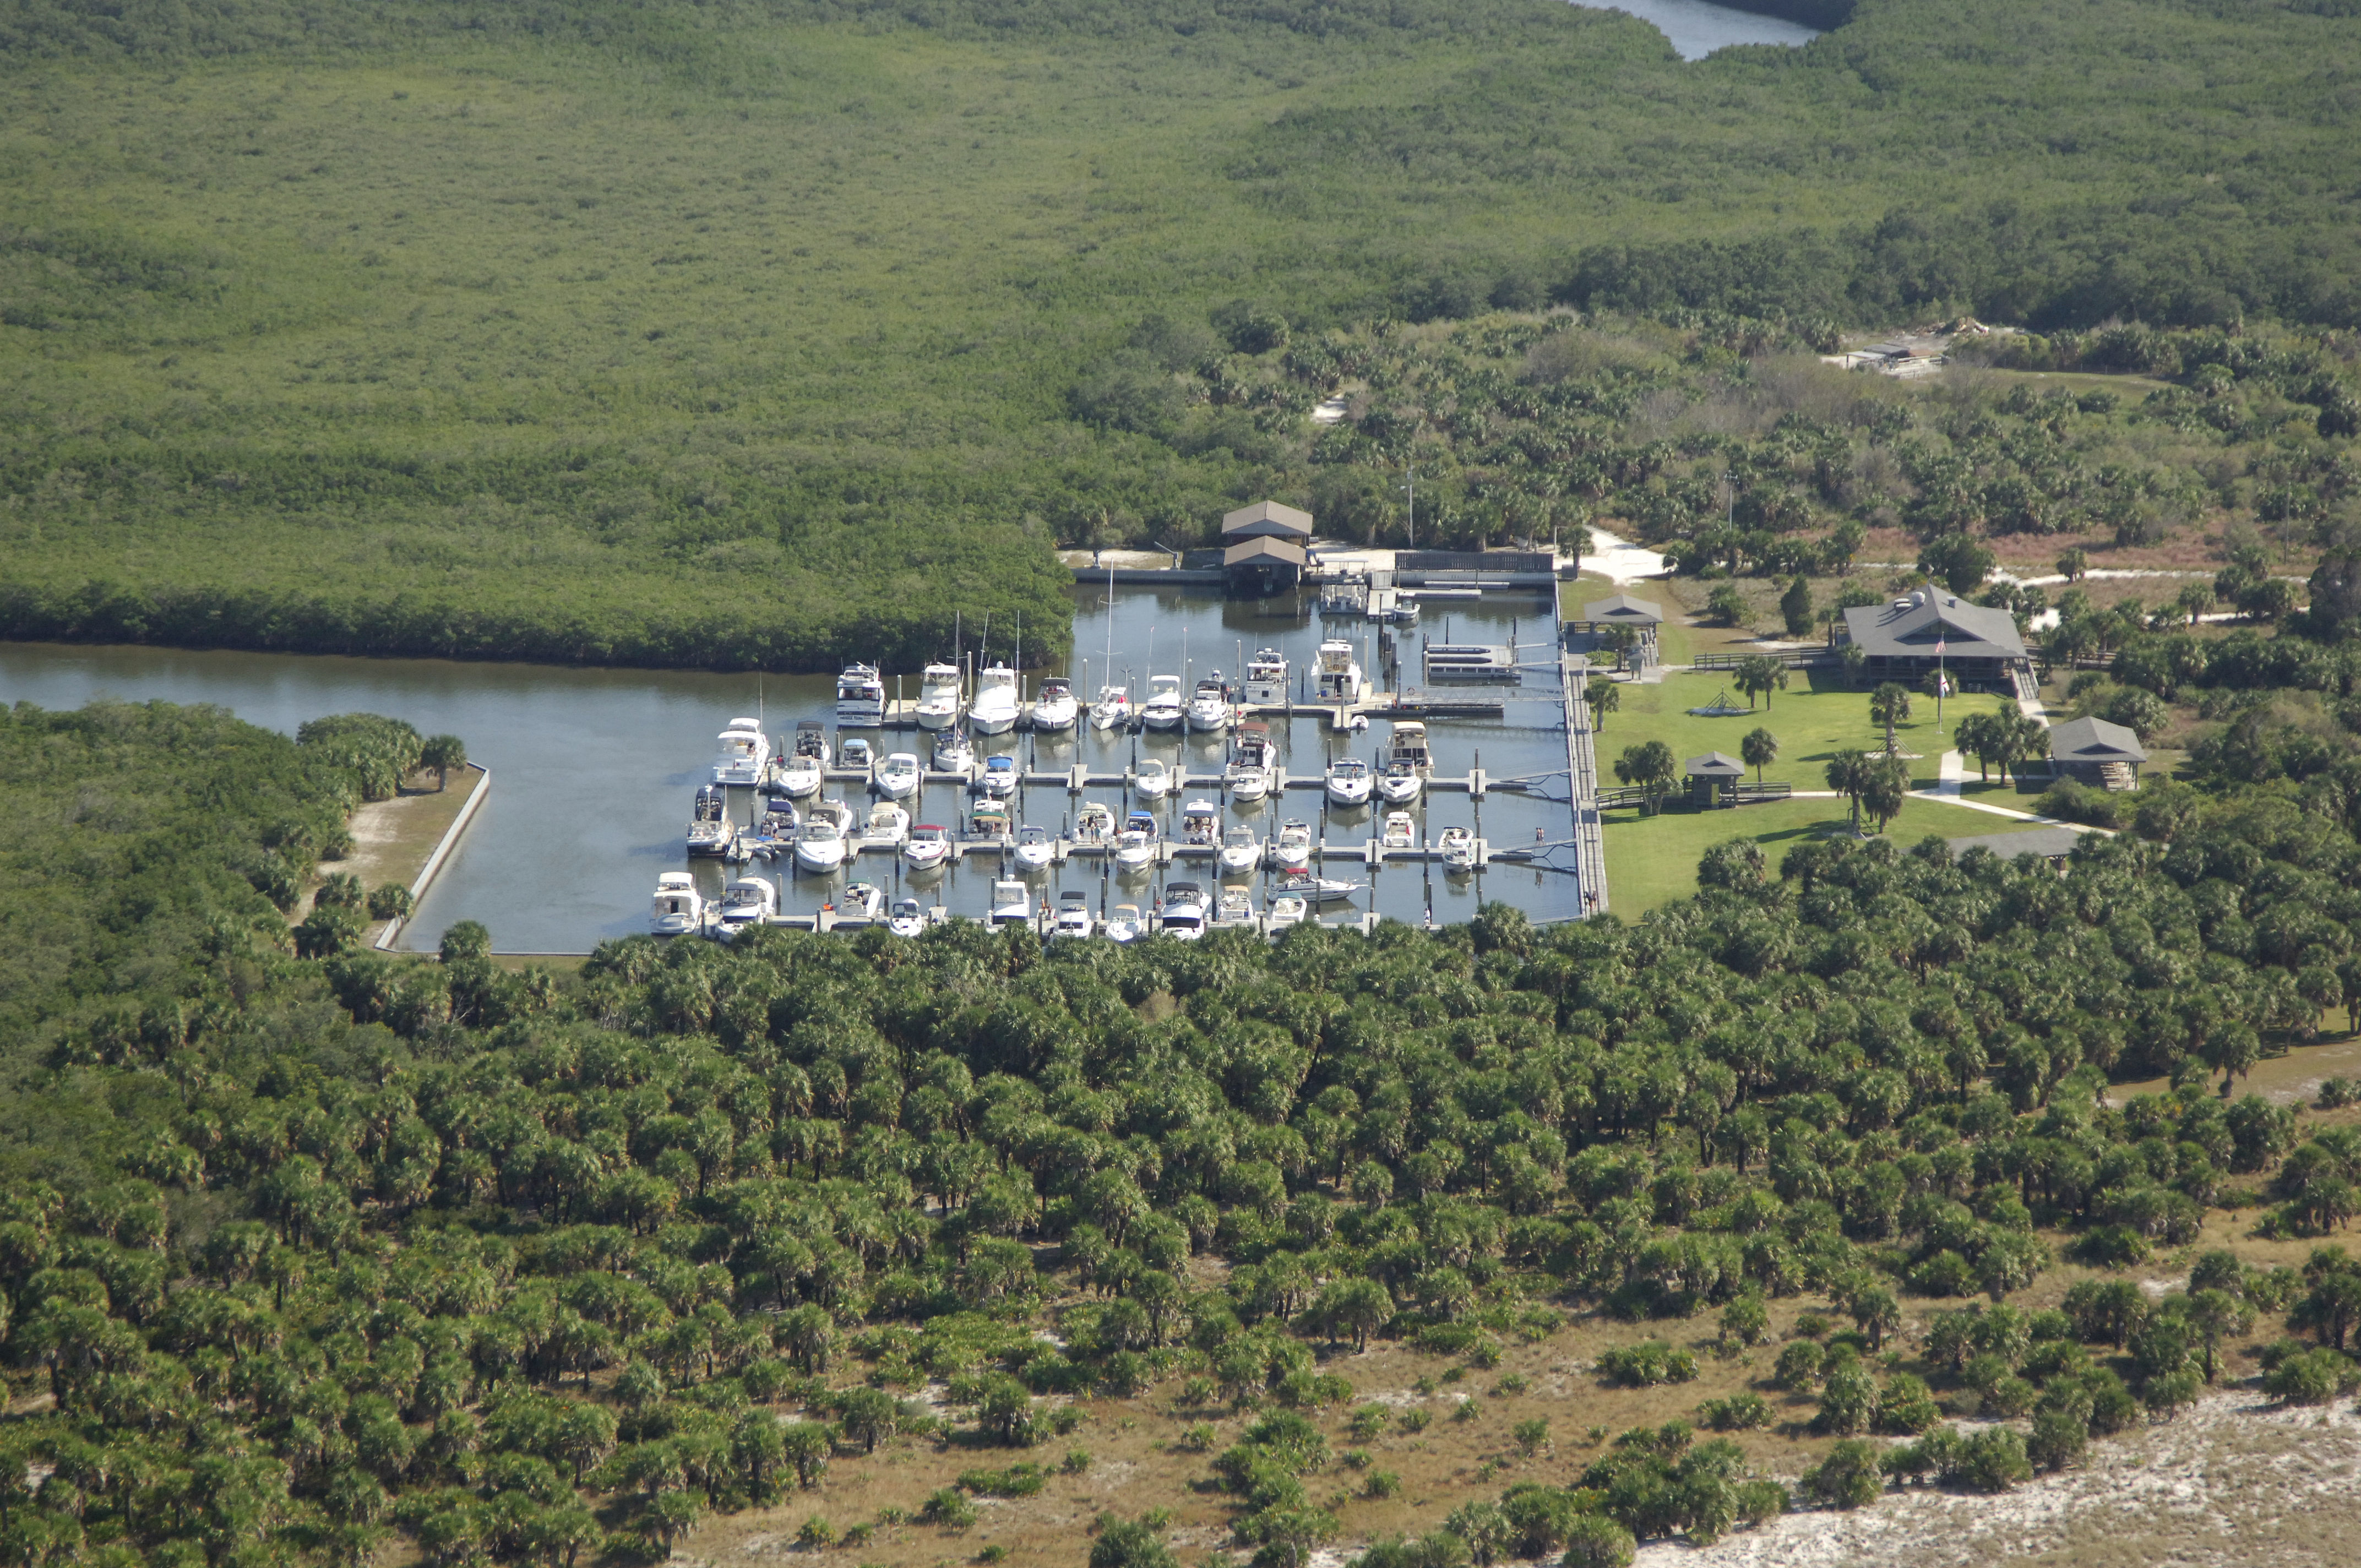 Caladesi island state park marina in dunedin fl united states caladesi island state park marina nvjuhfo Images